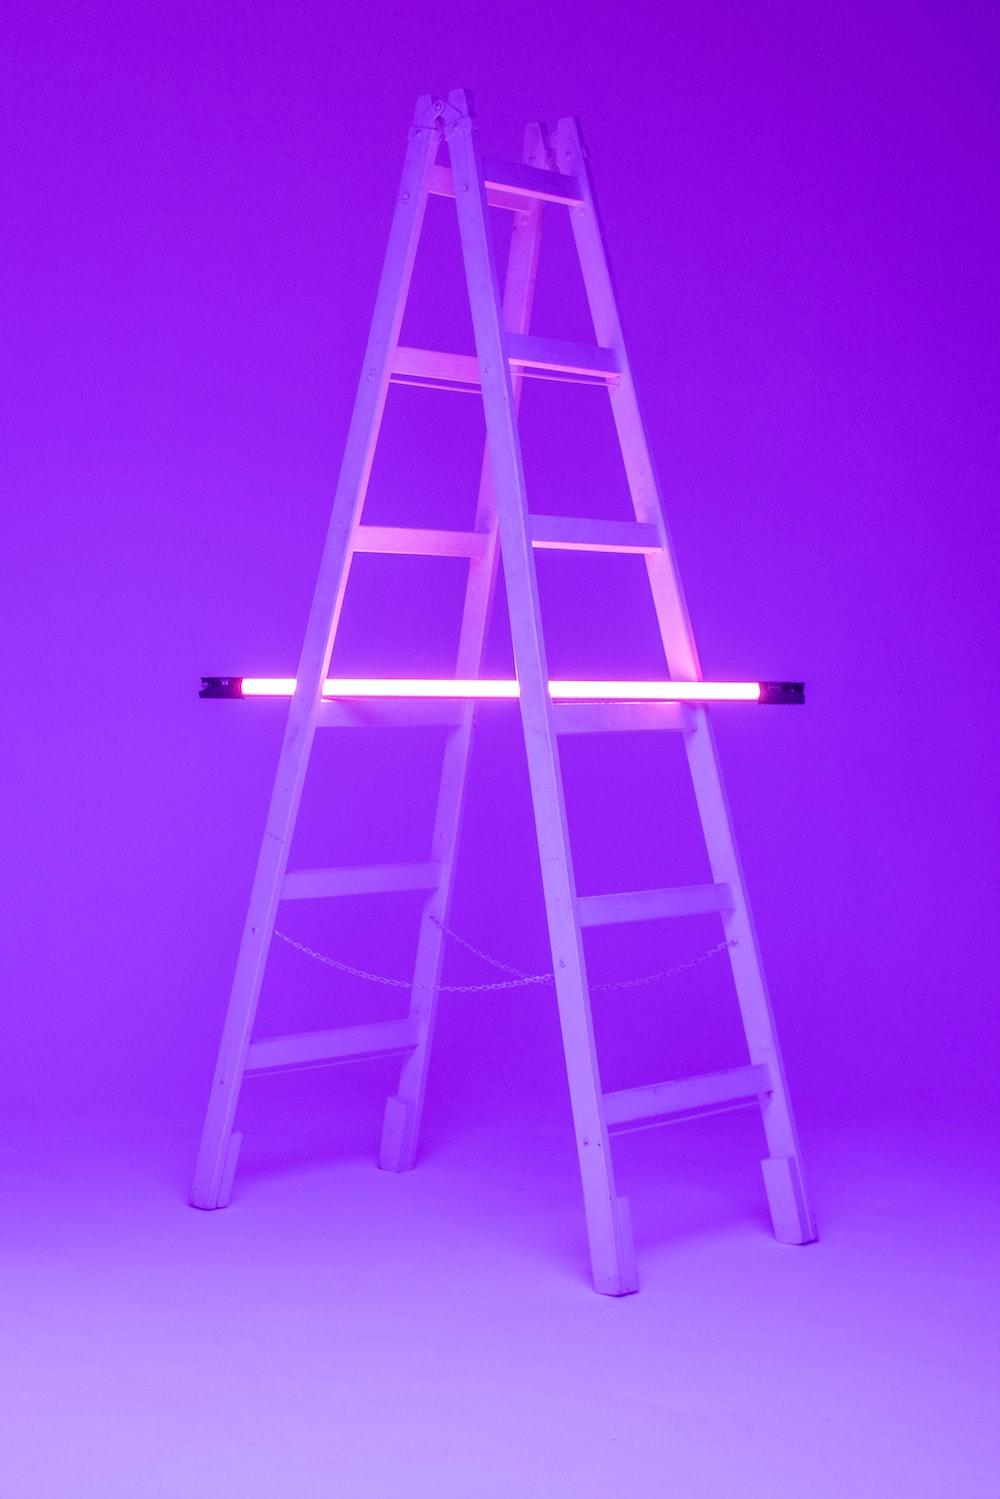 turned-on fluorescent lamp on folding ladder